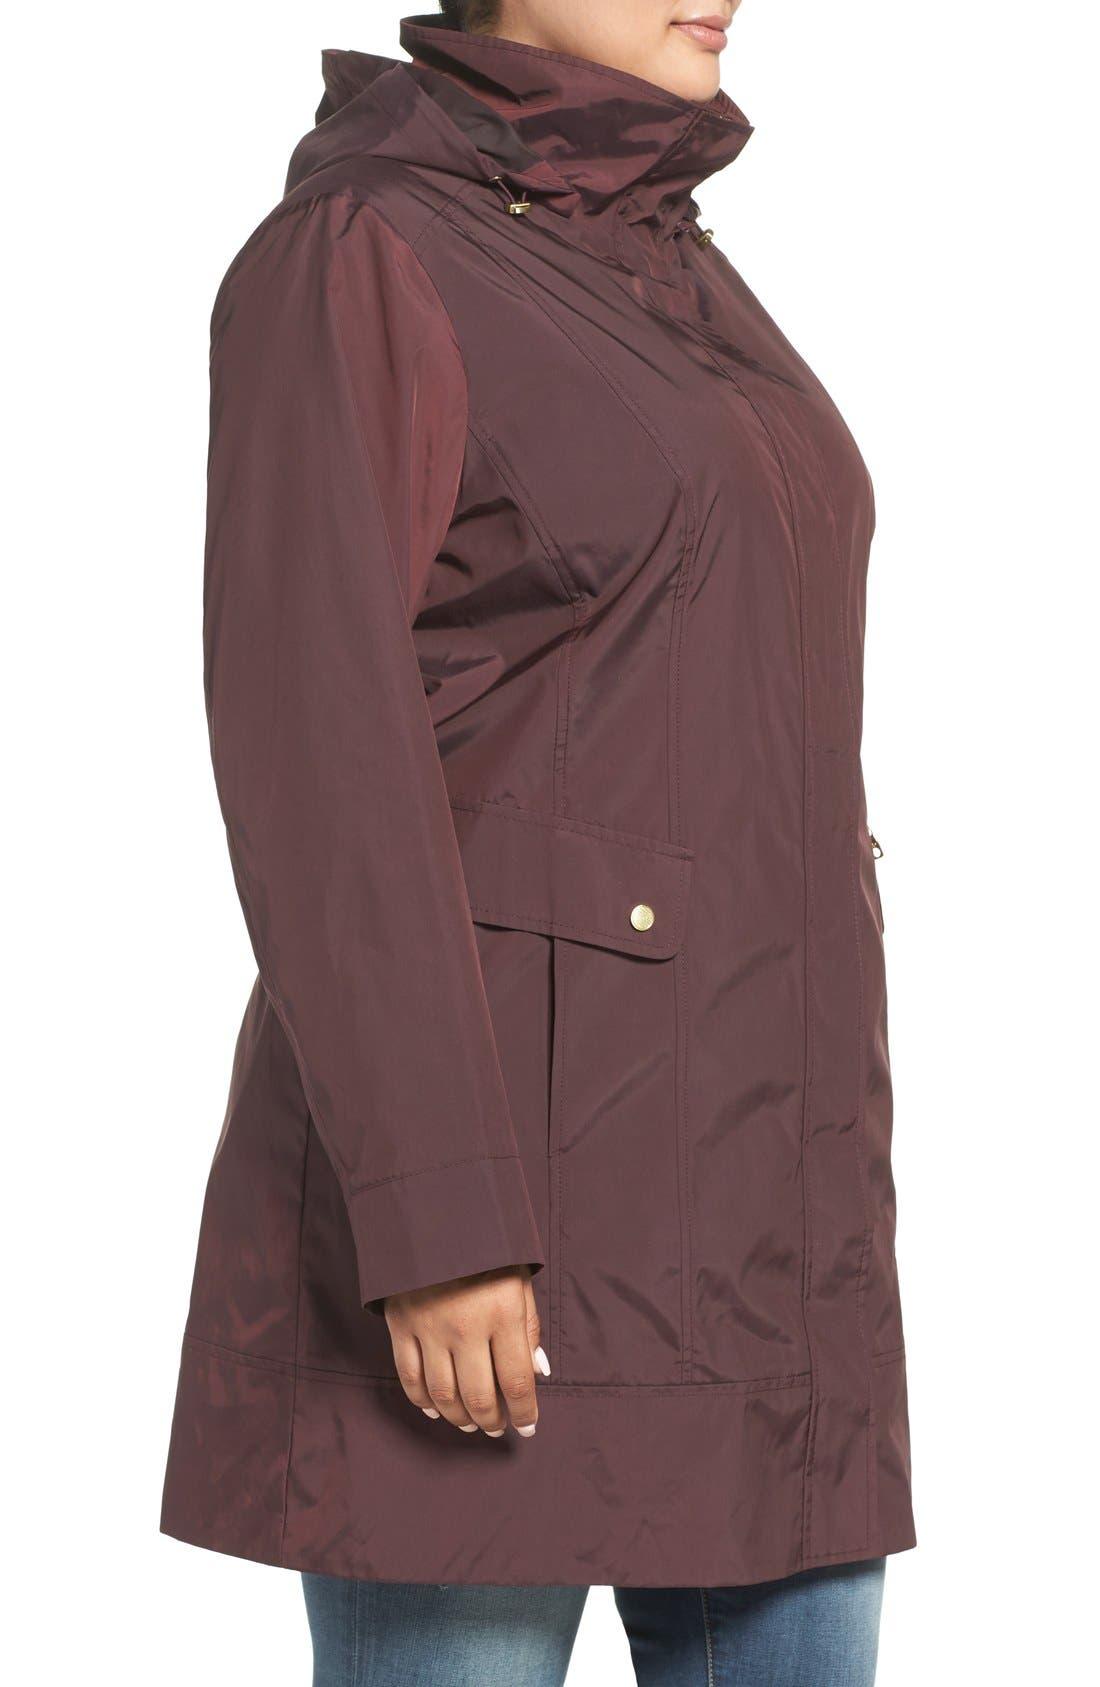 Cole Haan Water Resistant Rain Jacket,                             Alternate thumbnail 3, color,                             Eggplant